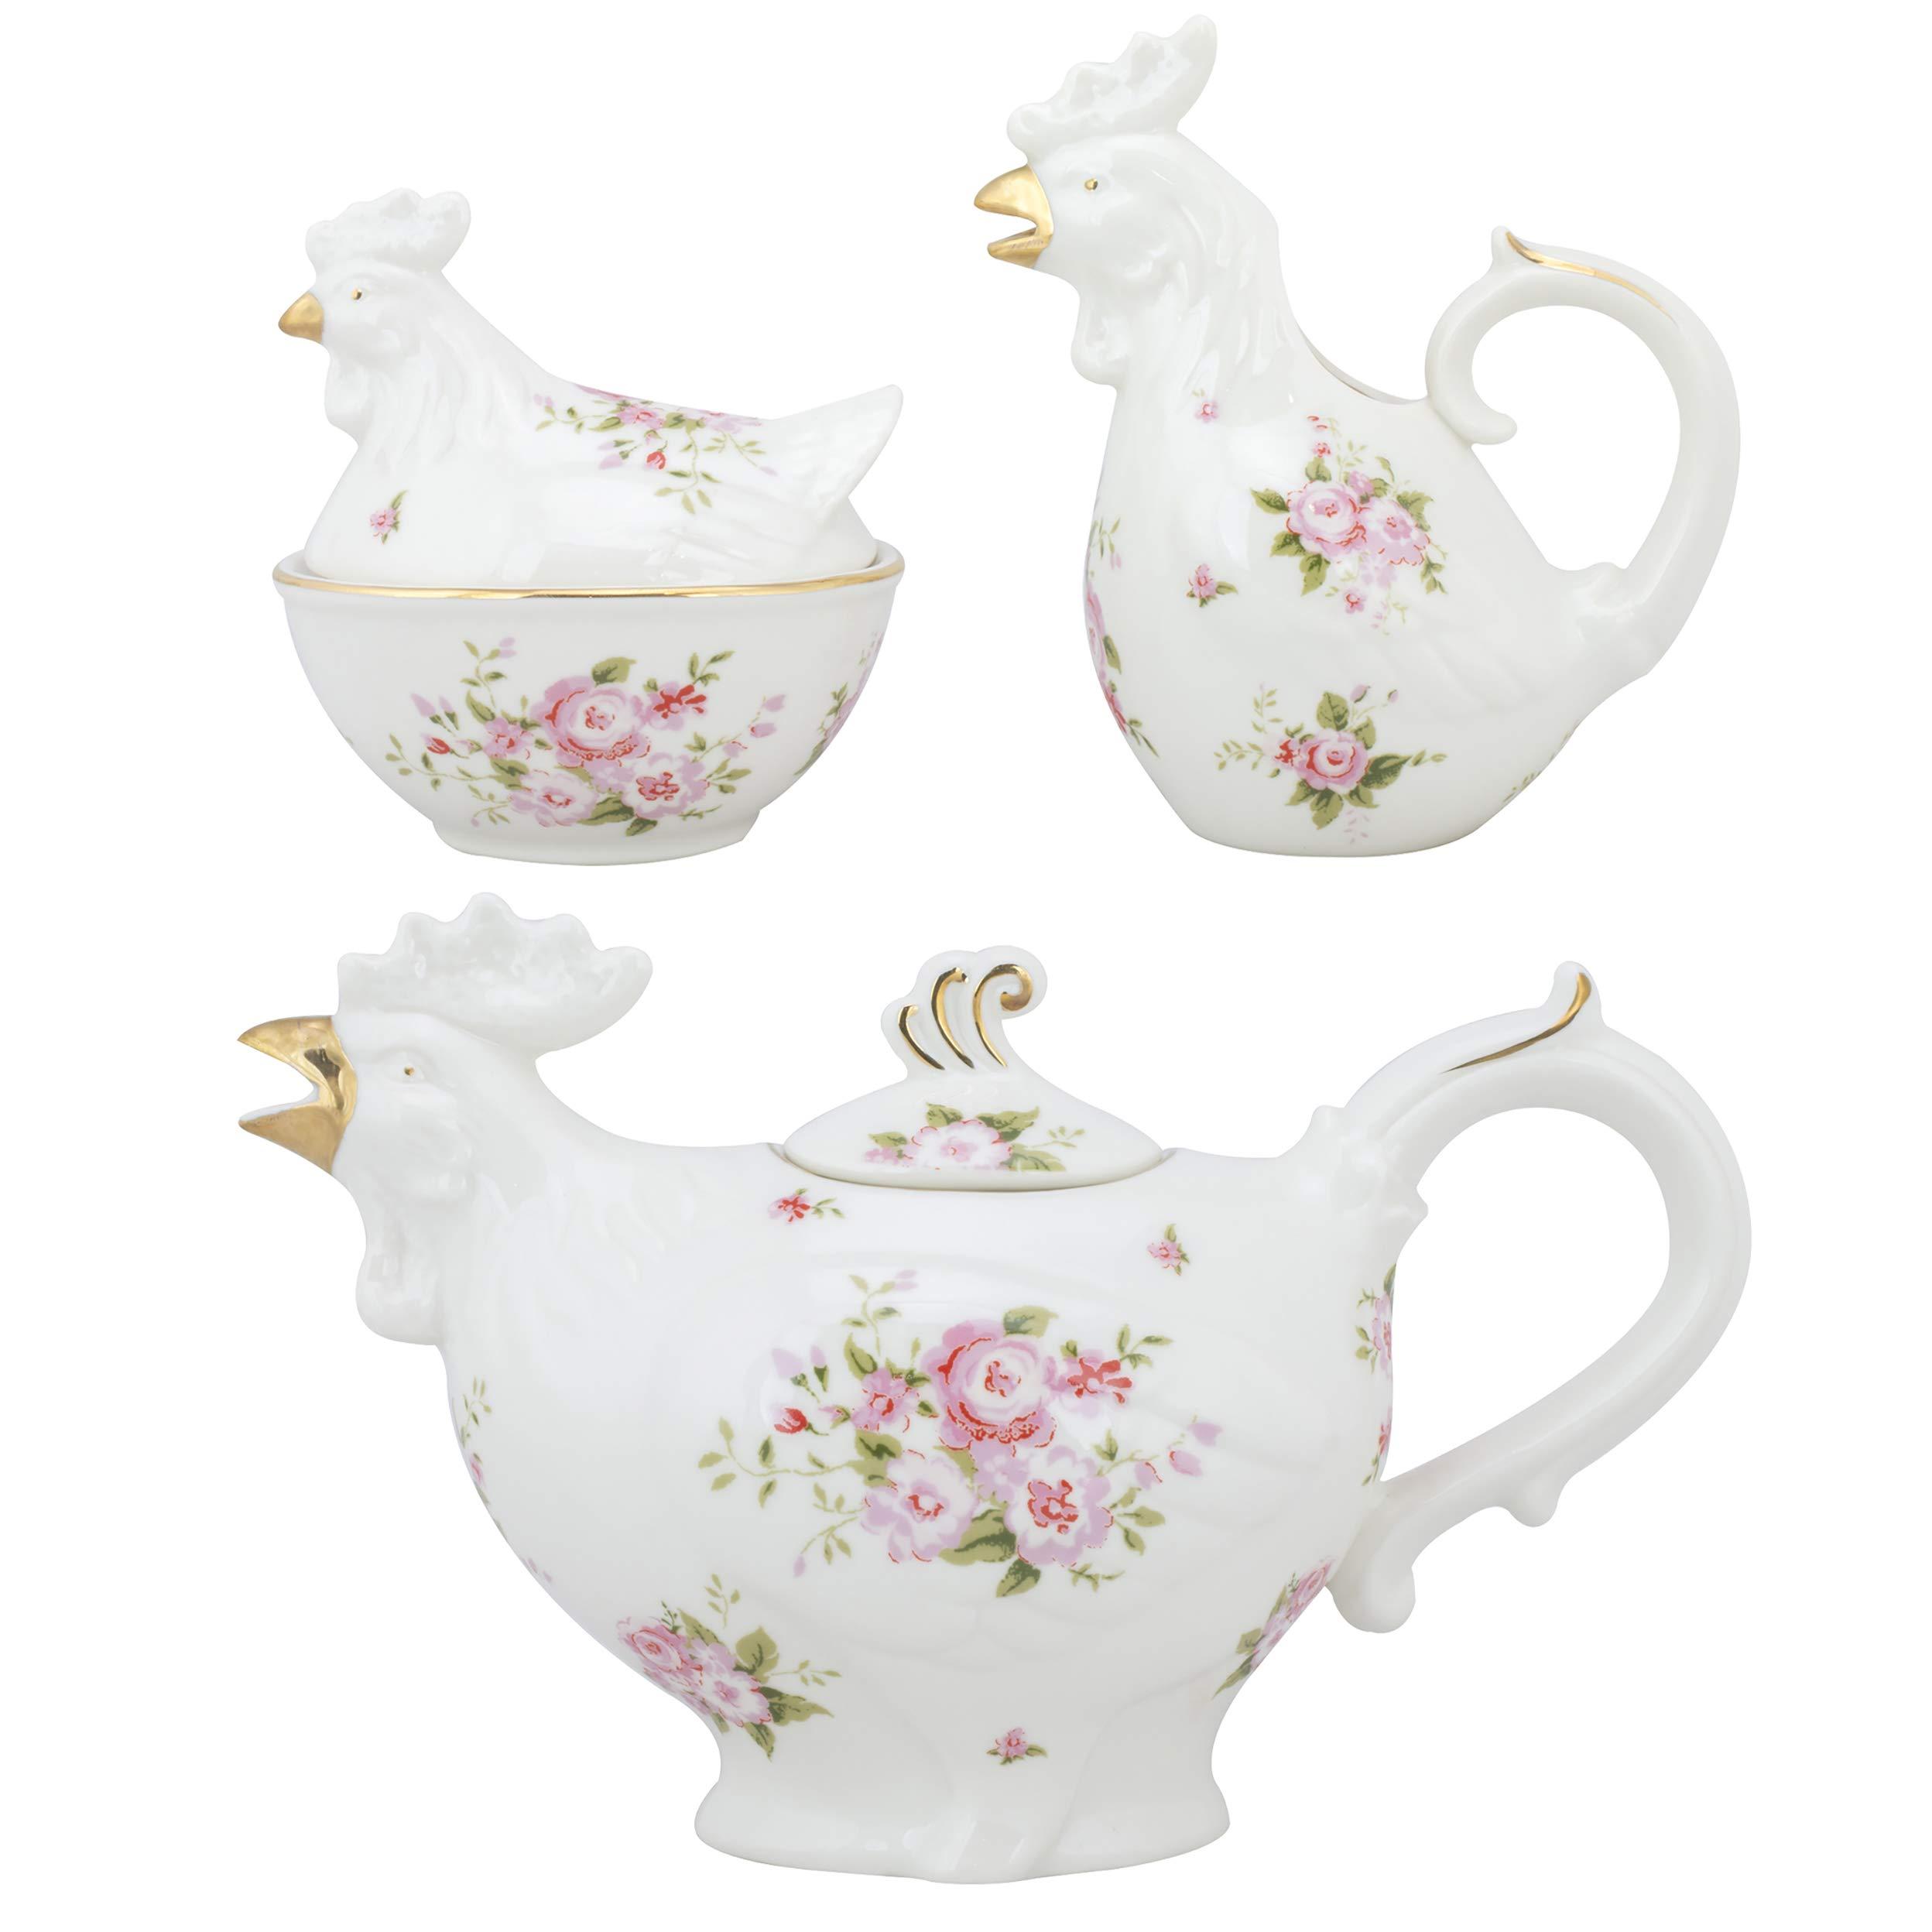 Grace Teaware Fine Porcelain Rooster 22-Ounce 3pc Tea Set (Floral Rose) with Gold Trim